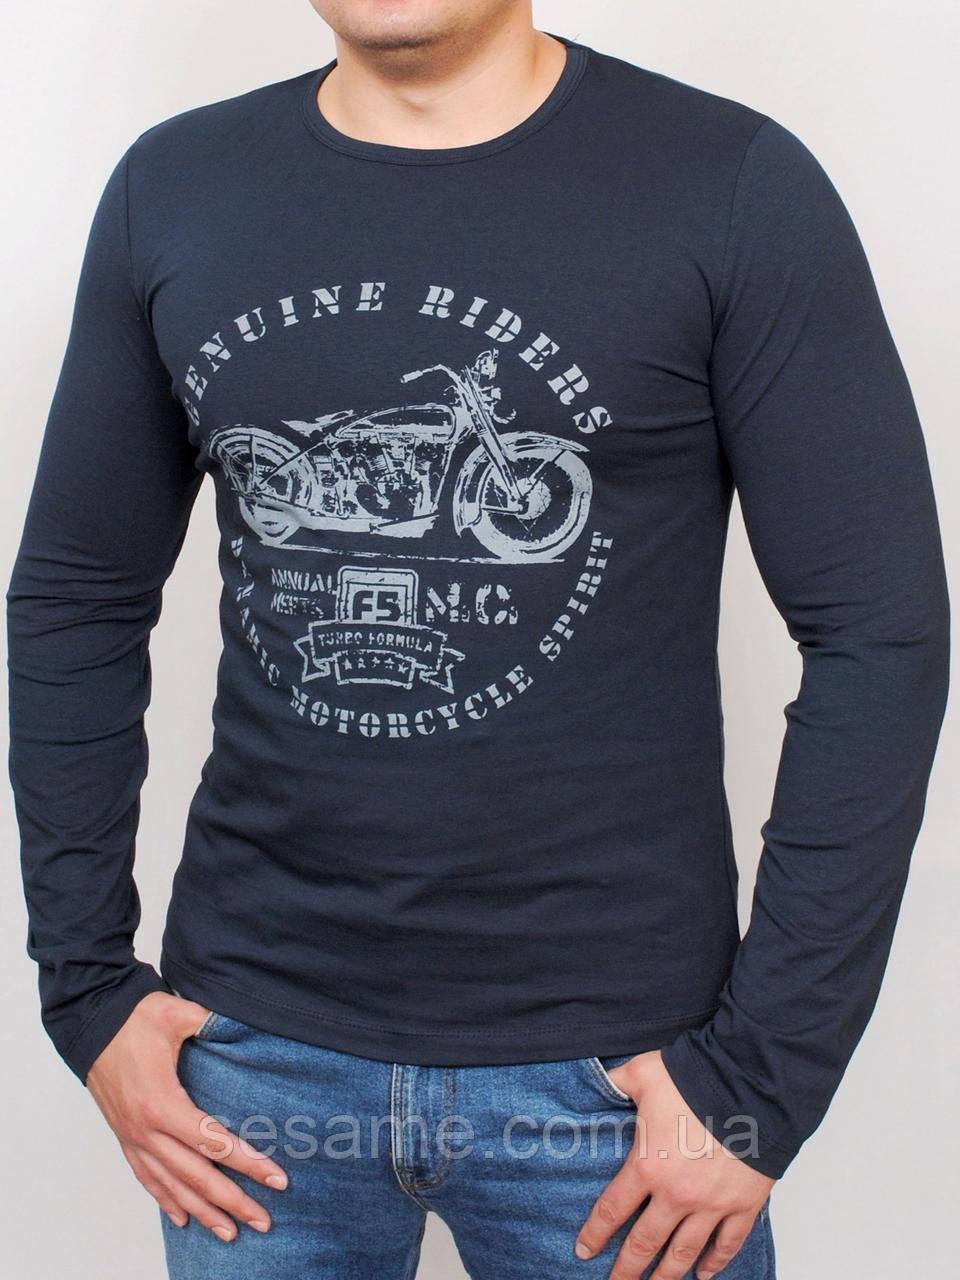 grand ua MOTOR футболка длинный рукав